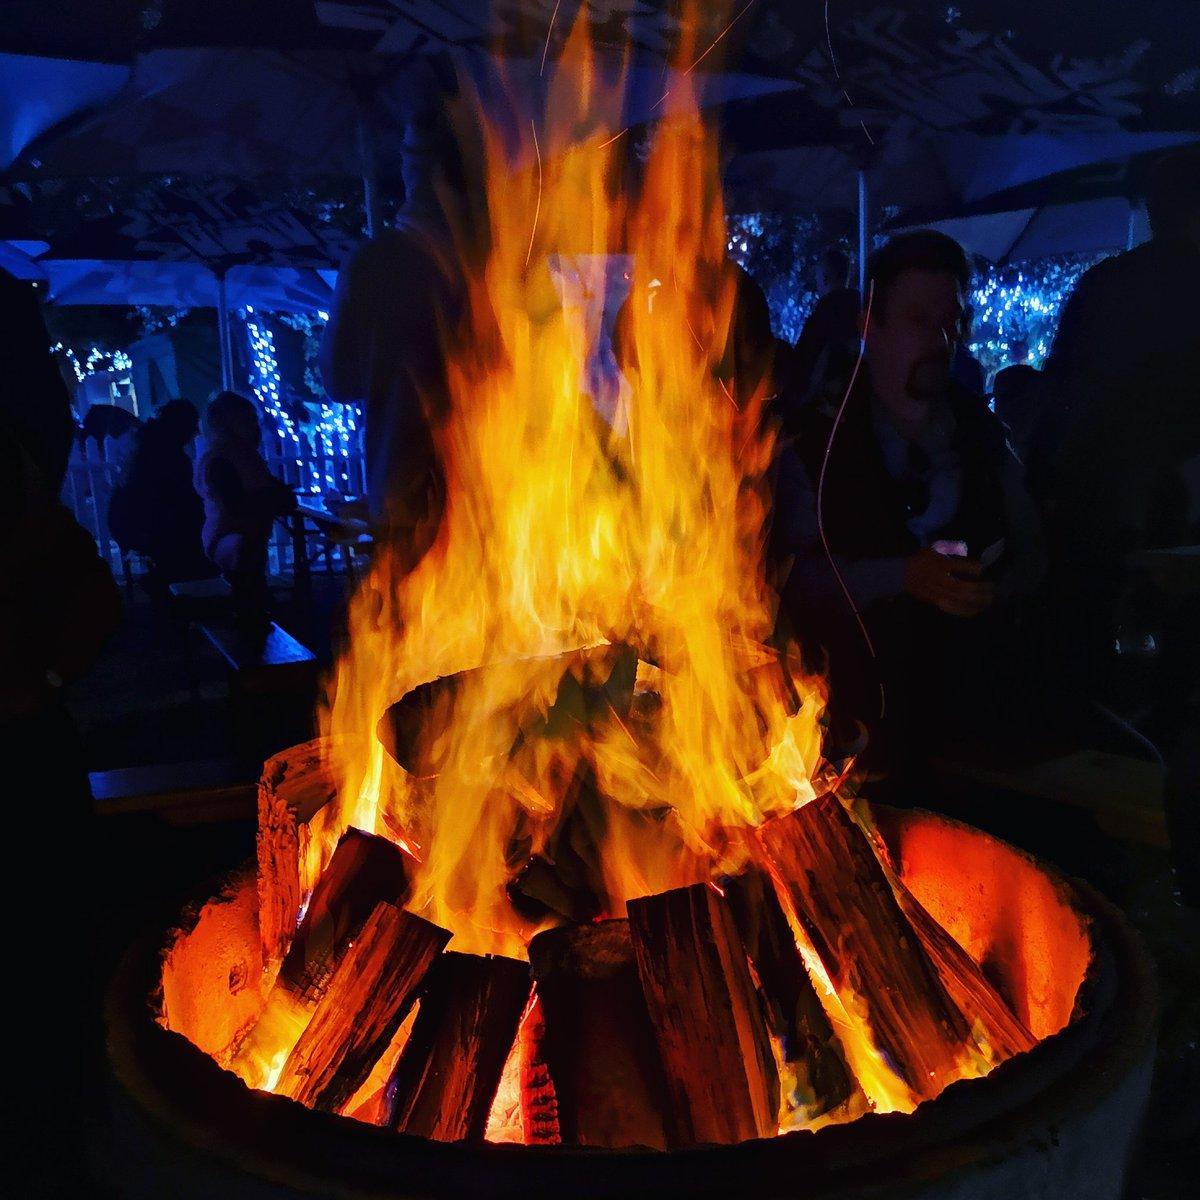 Keeping warm in #winterwonderland. #fire #winteriscoming https://t.co/QMpgveF59n